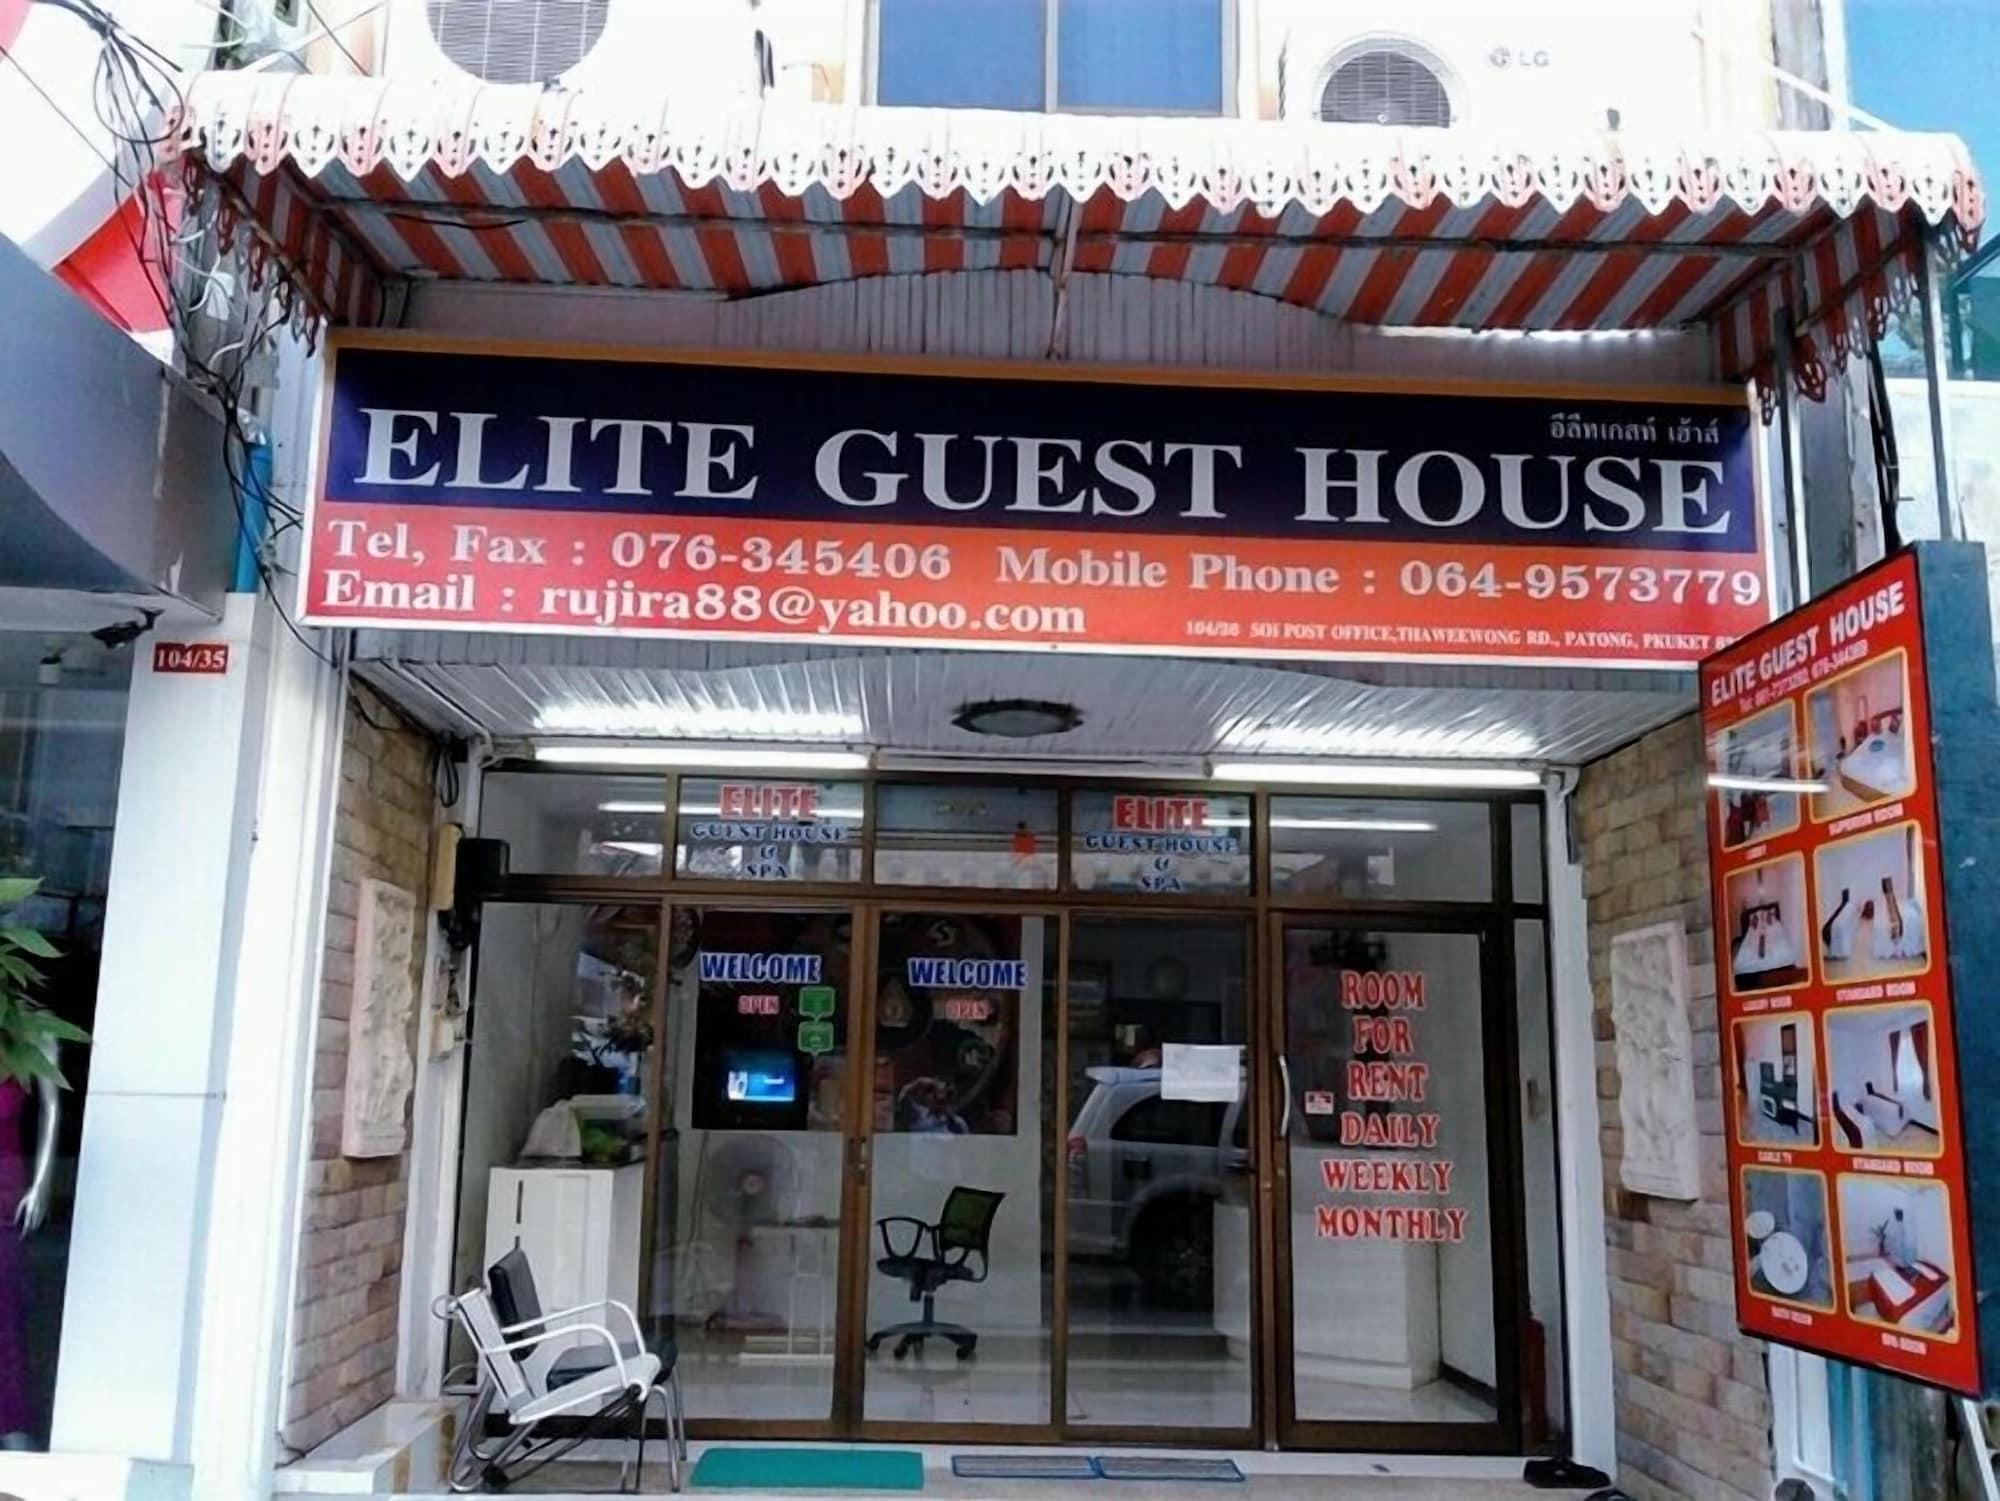 Elite Guesthouse, Pulau Phuket